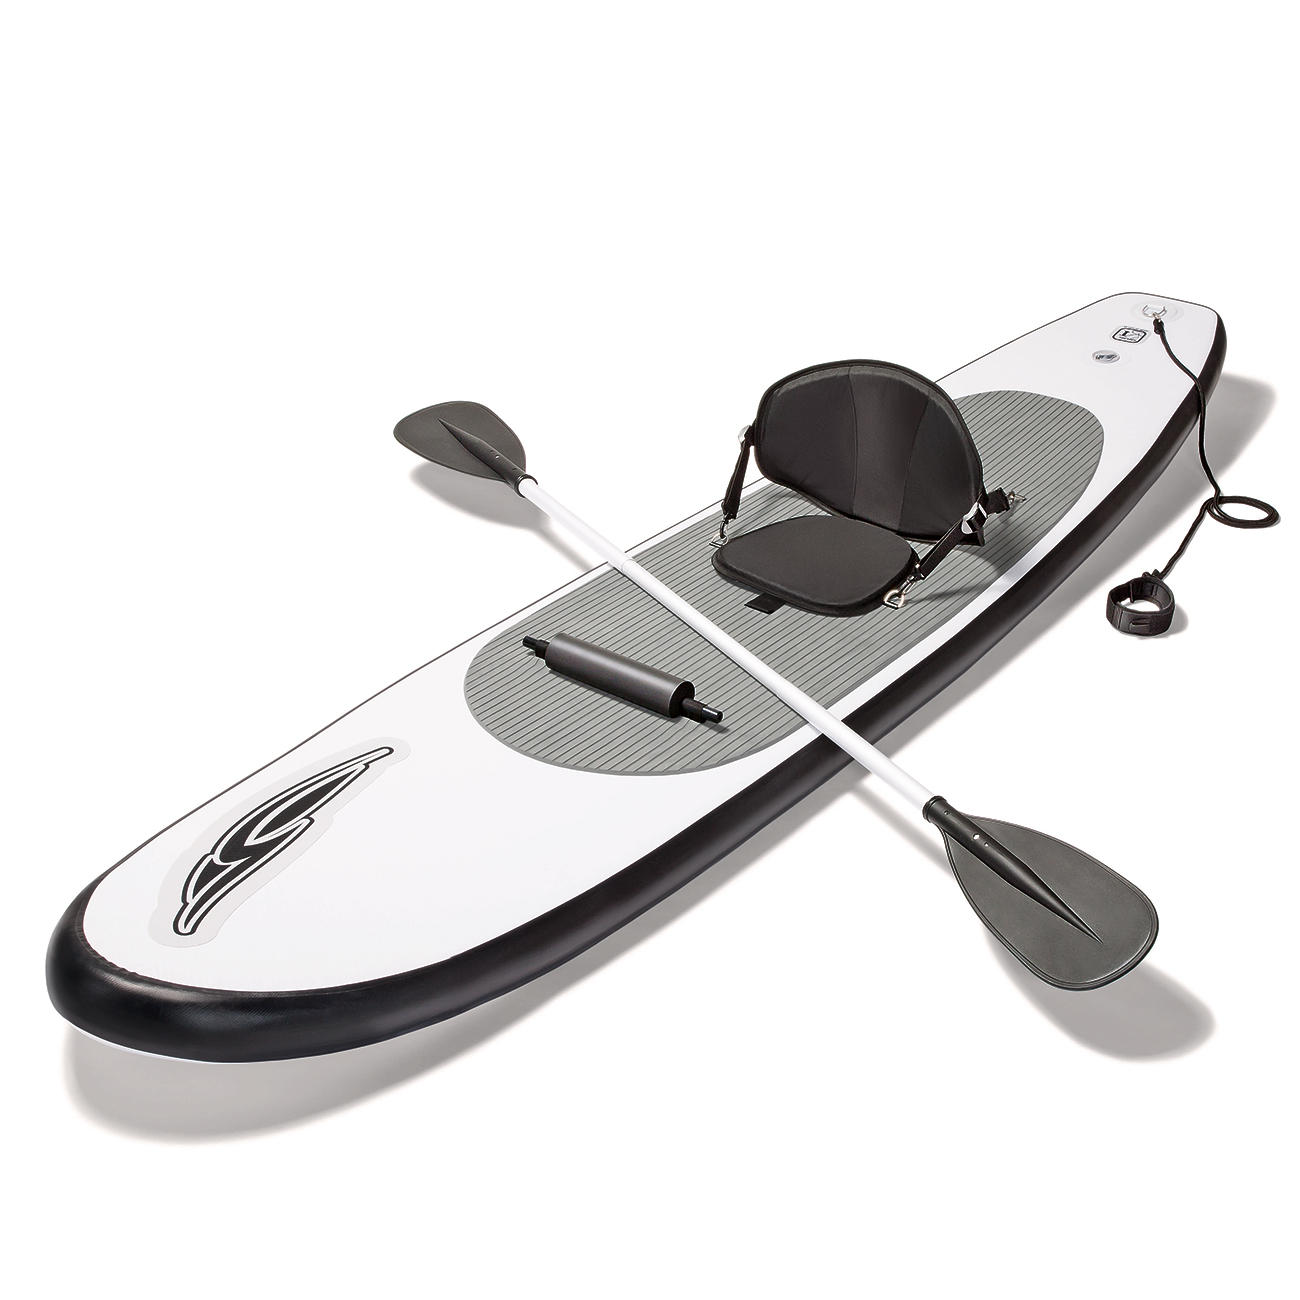 aufblasbares standup paddle board online kaufen sup board. Black Bedroom Furniture Sets. Home Design Ideas